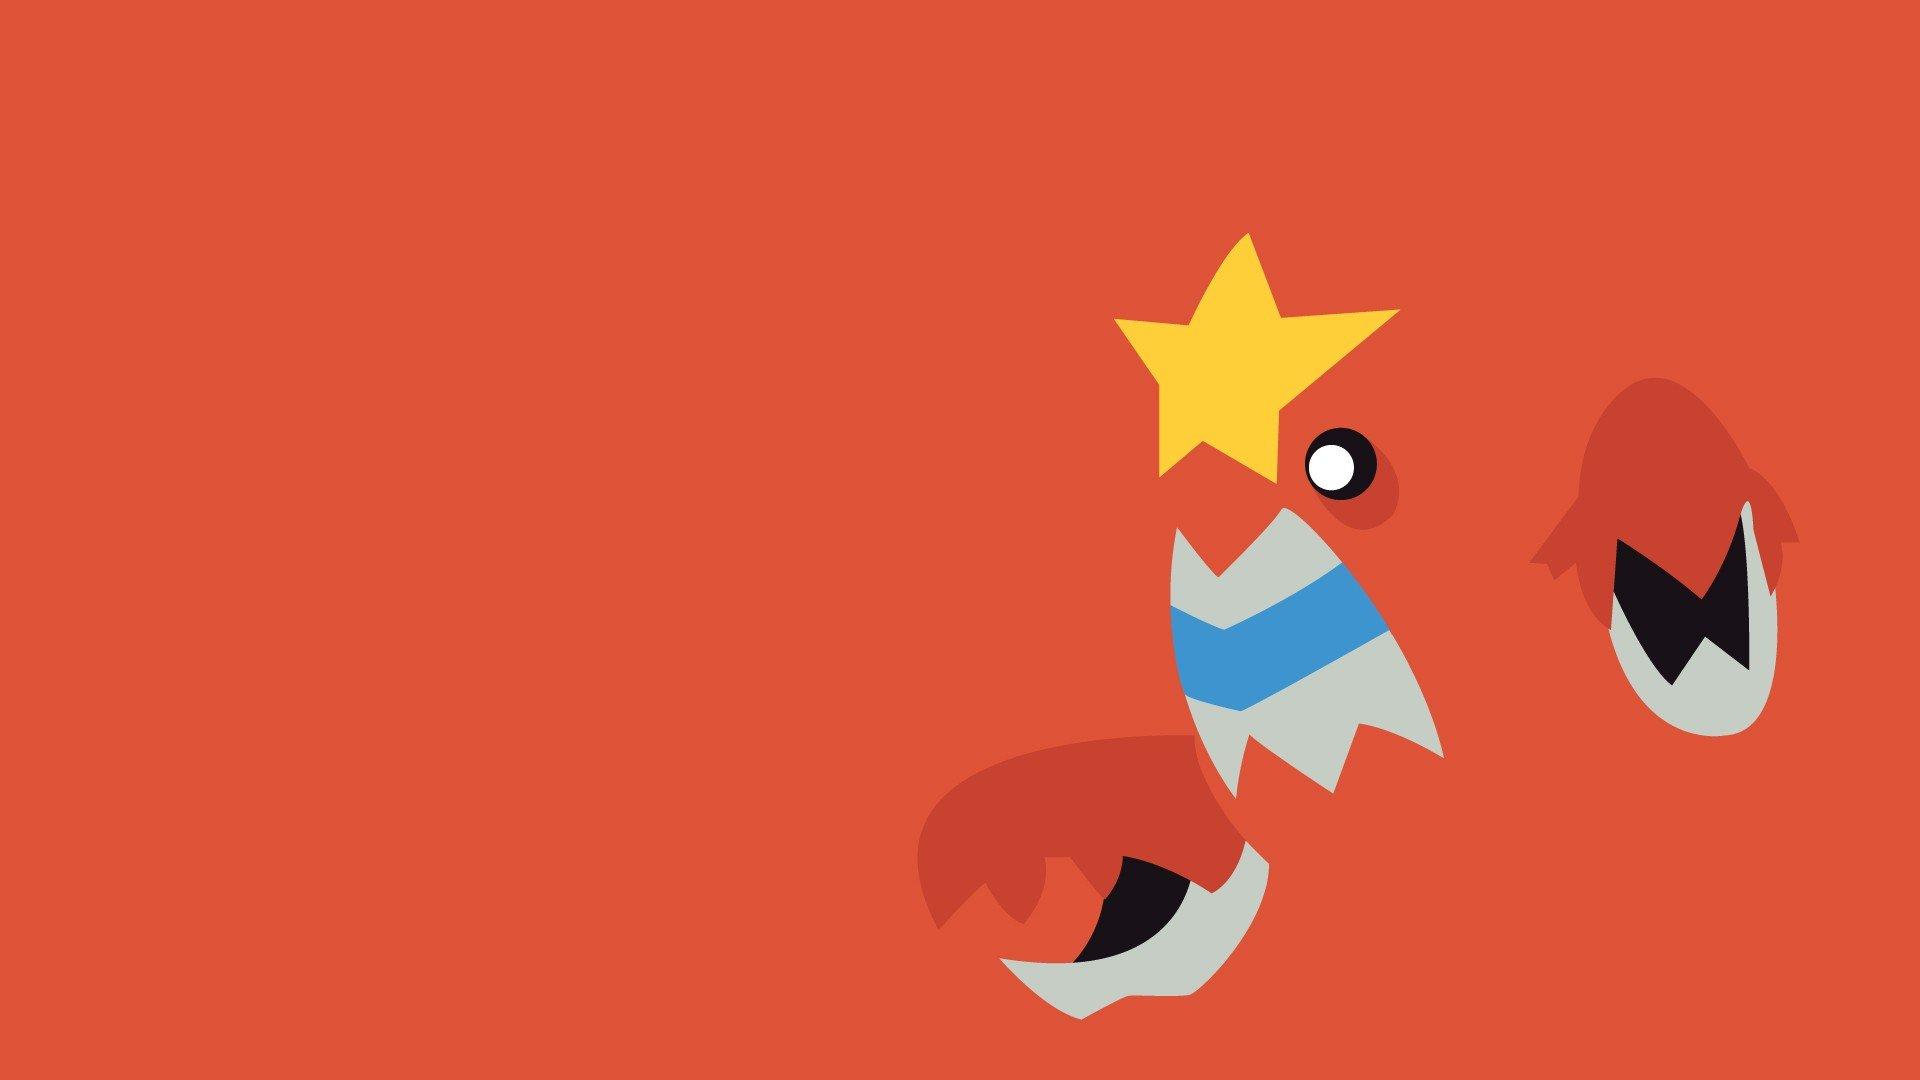 cartoons pokemon minimalistic wallpaper 1920x1080